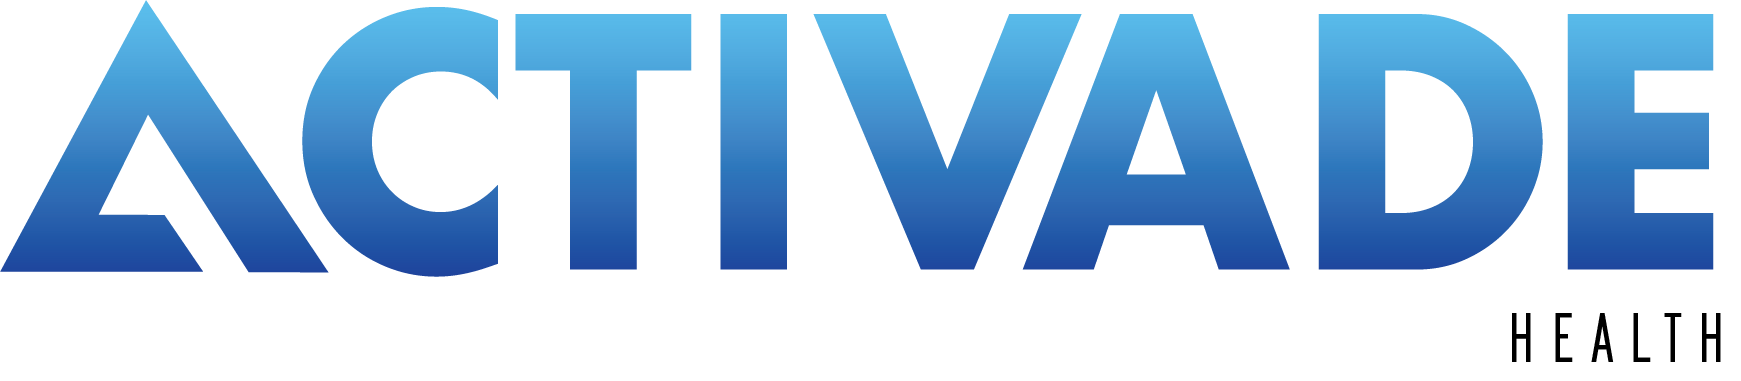 Activade_Gradient-Logo (1).png